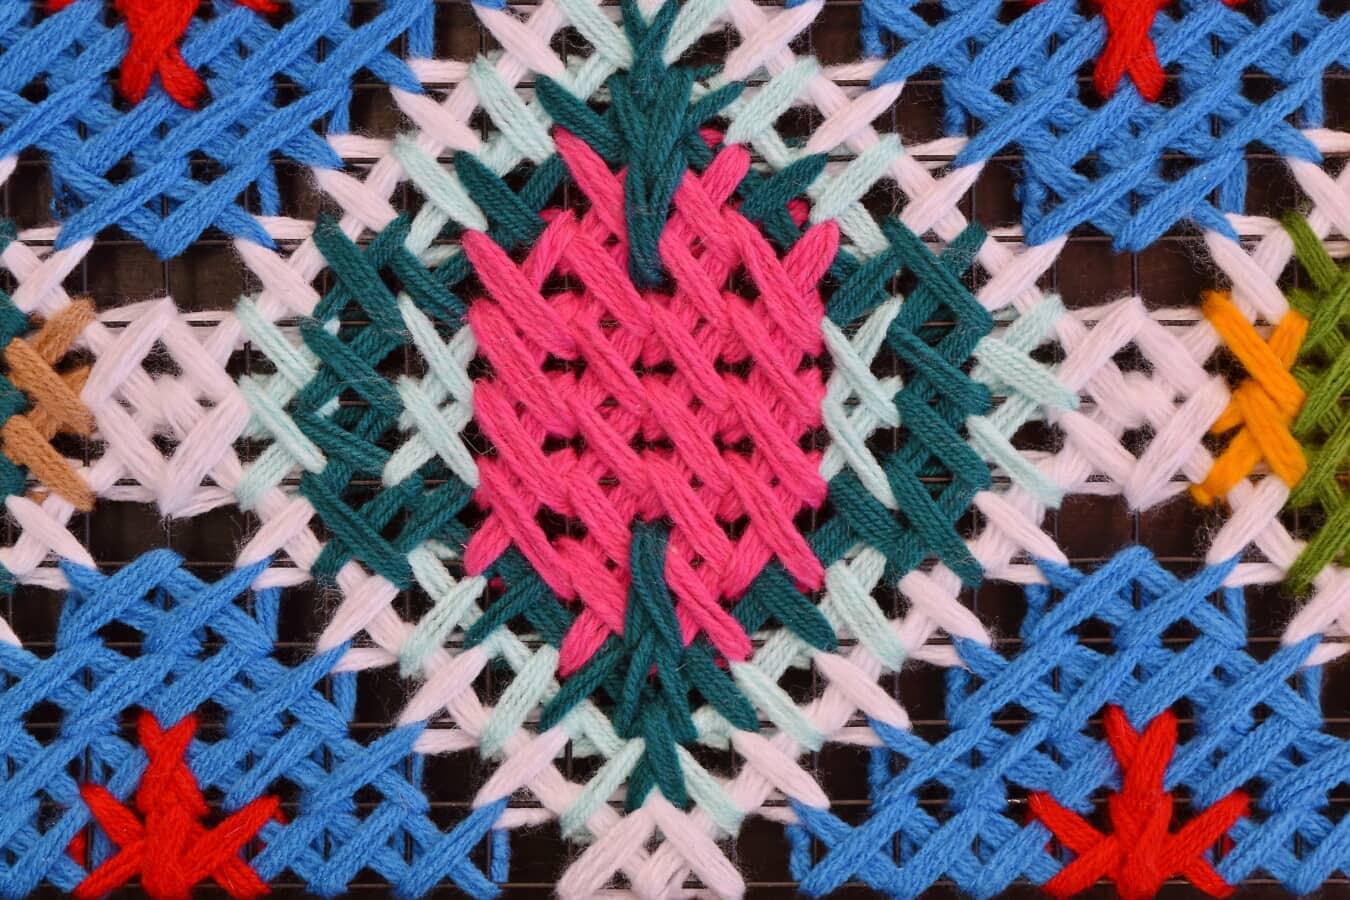 fiber, thread, wool, geometric, traditional, design, pattern, craft, mosaic, fabric